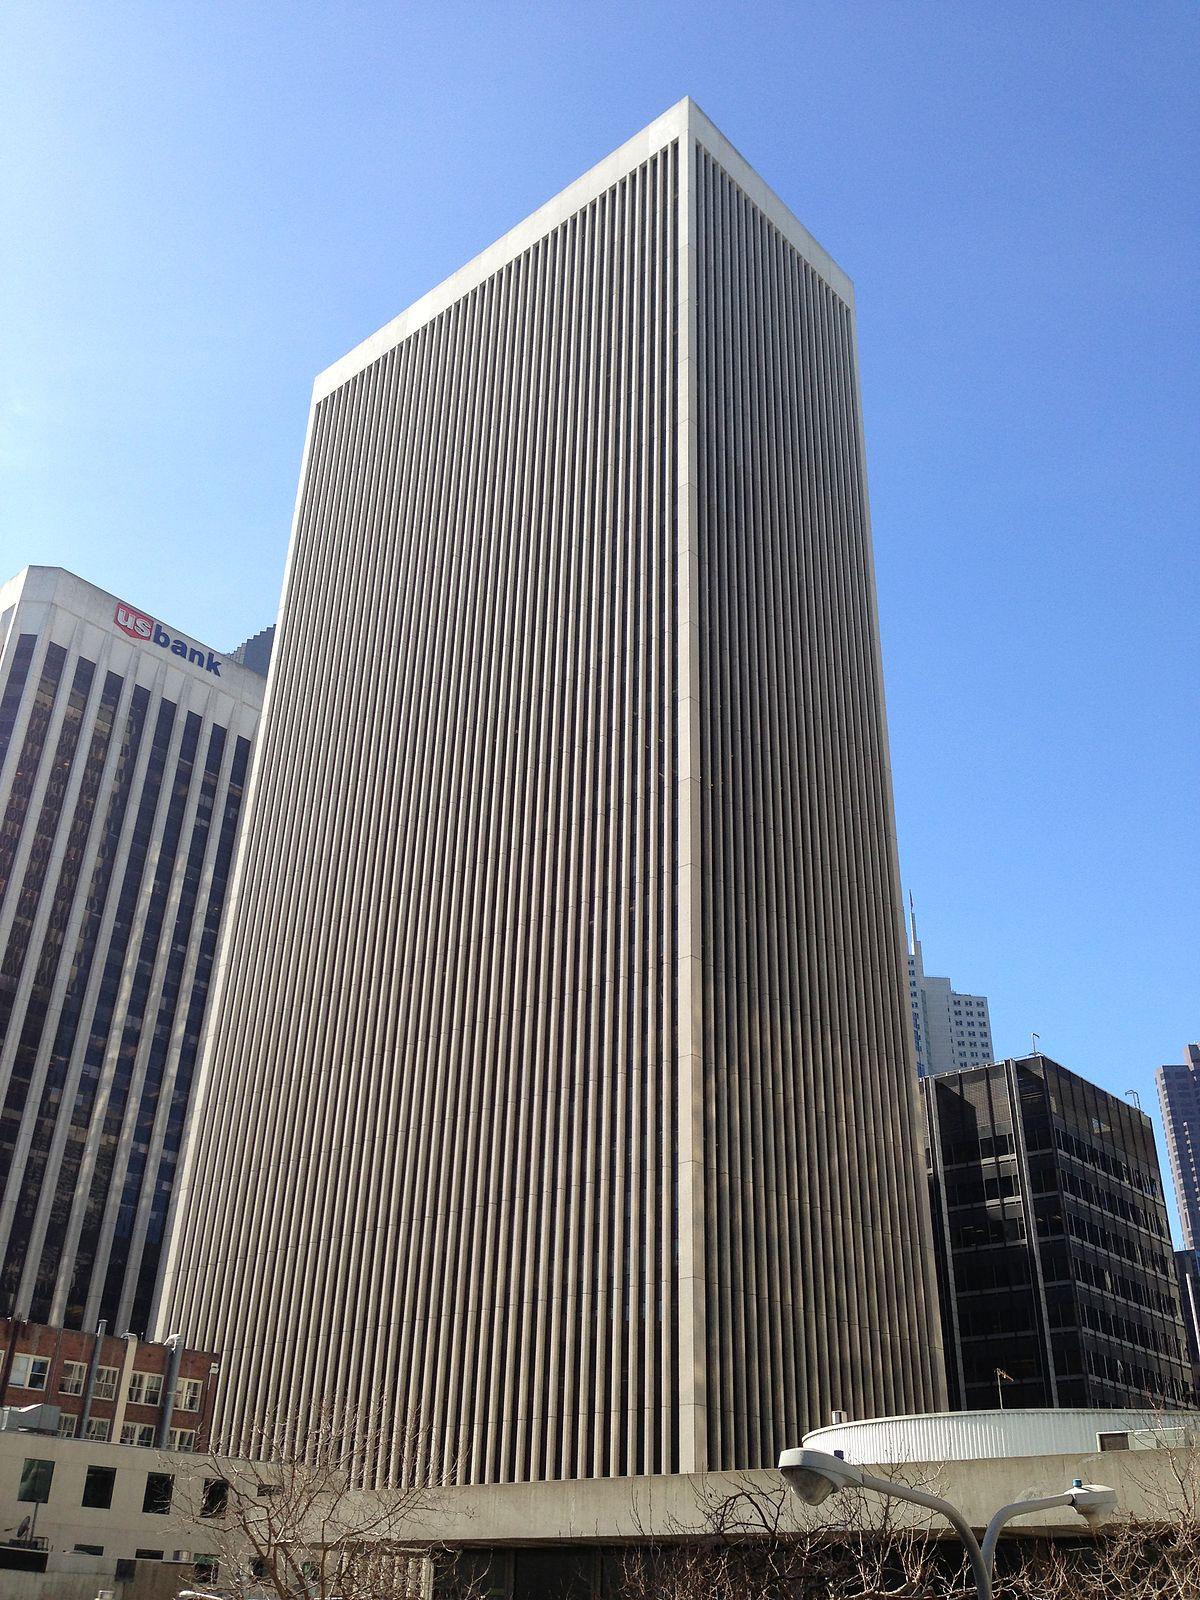 Union Bank California Building